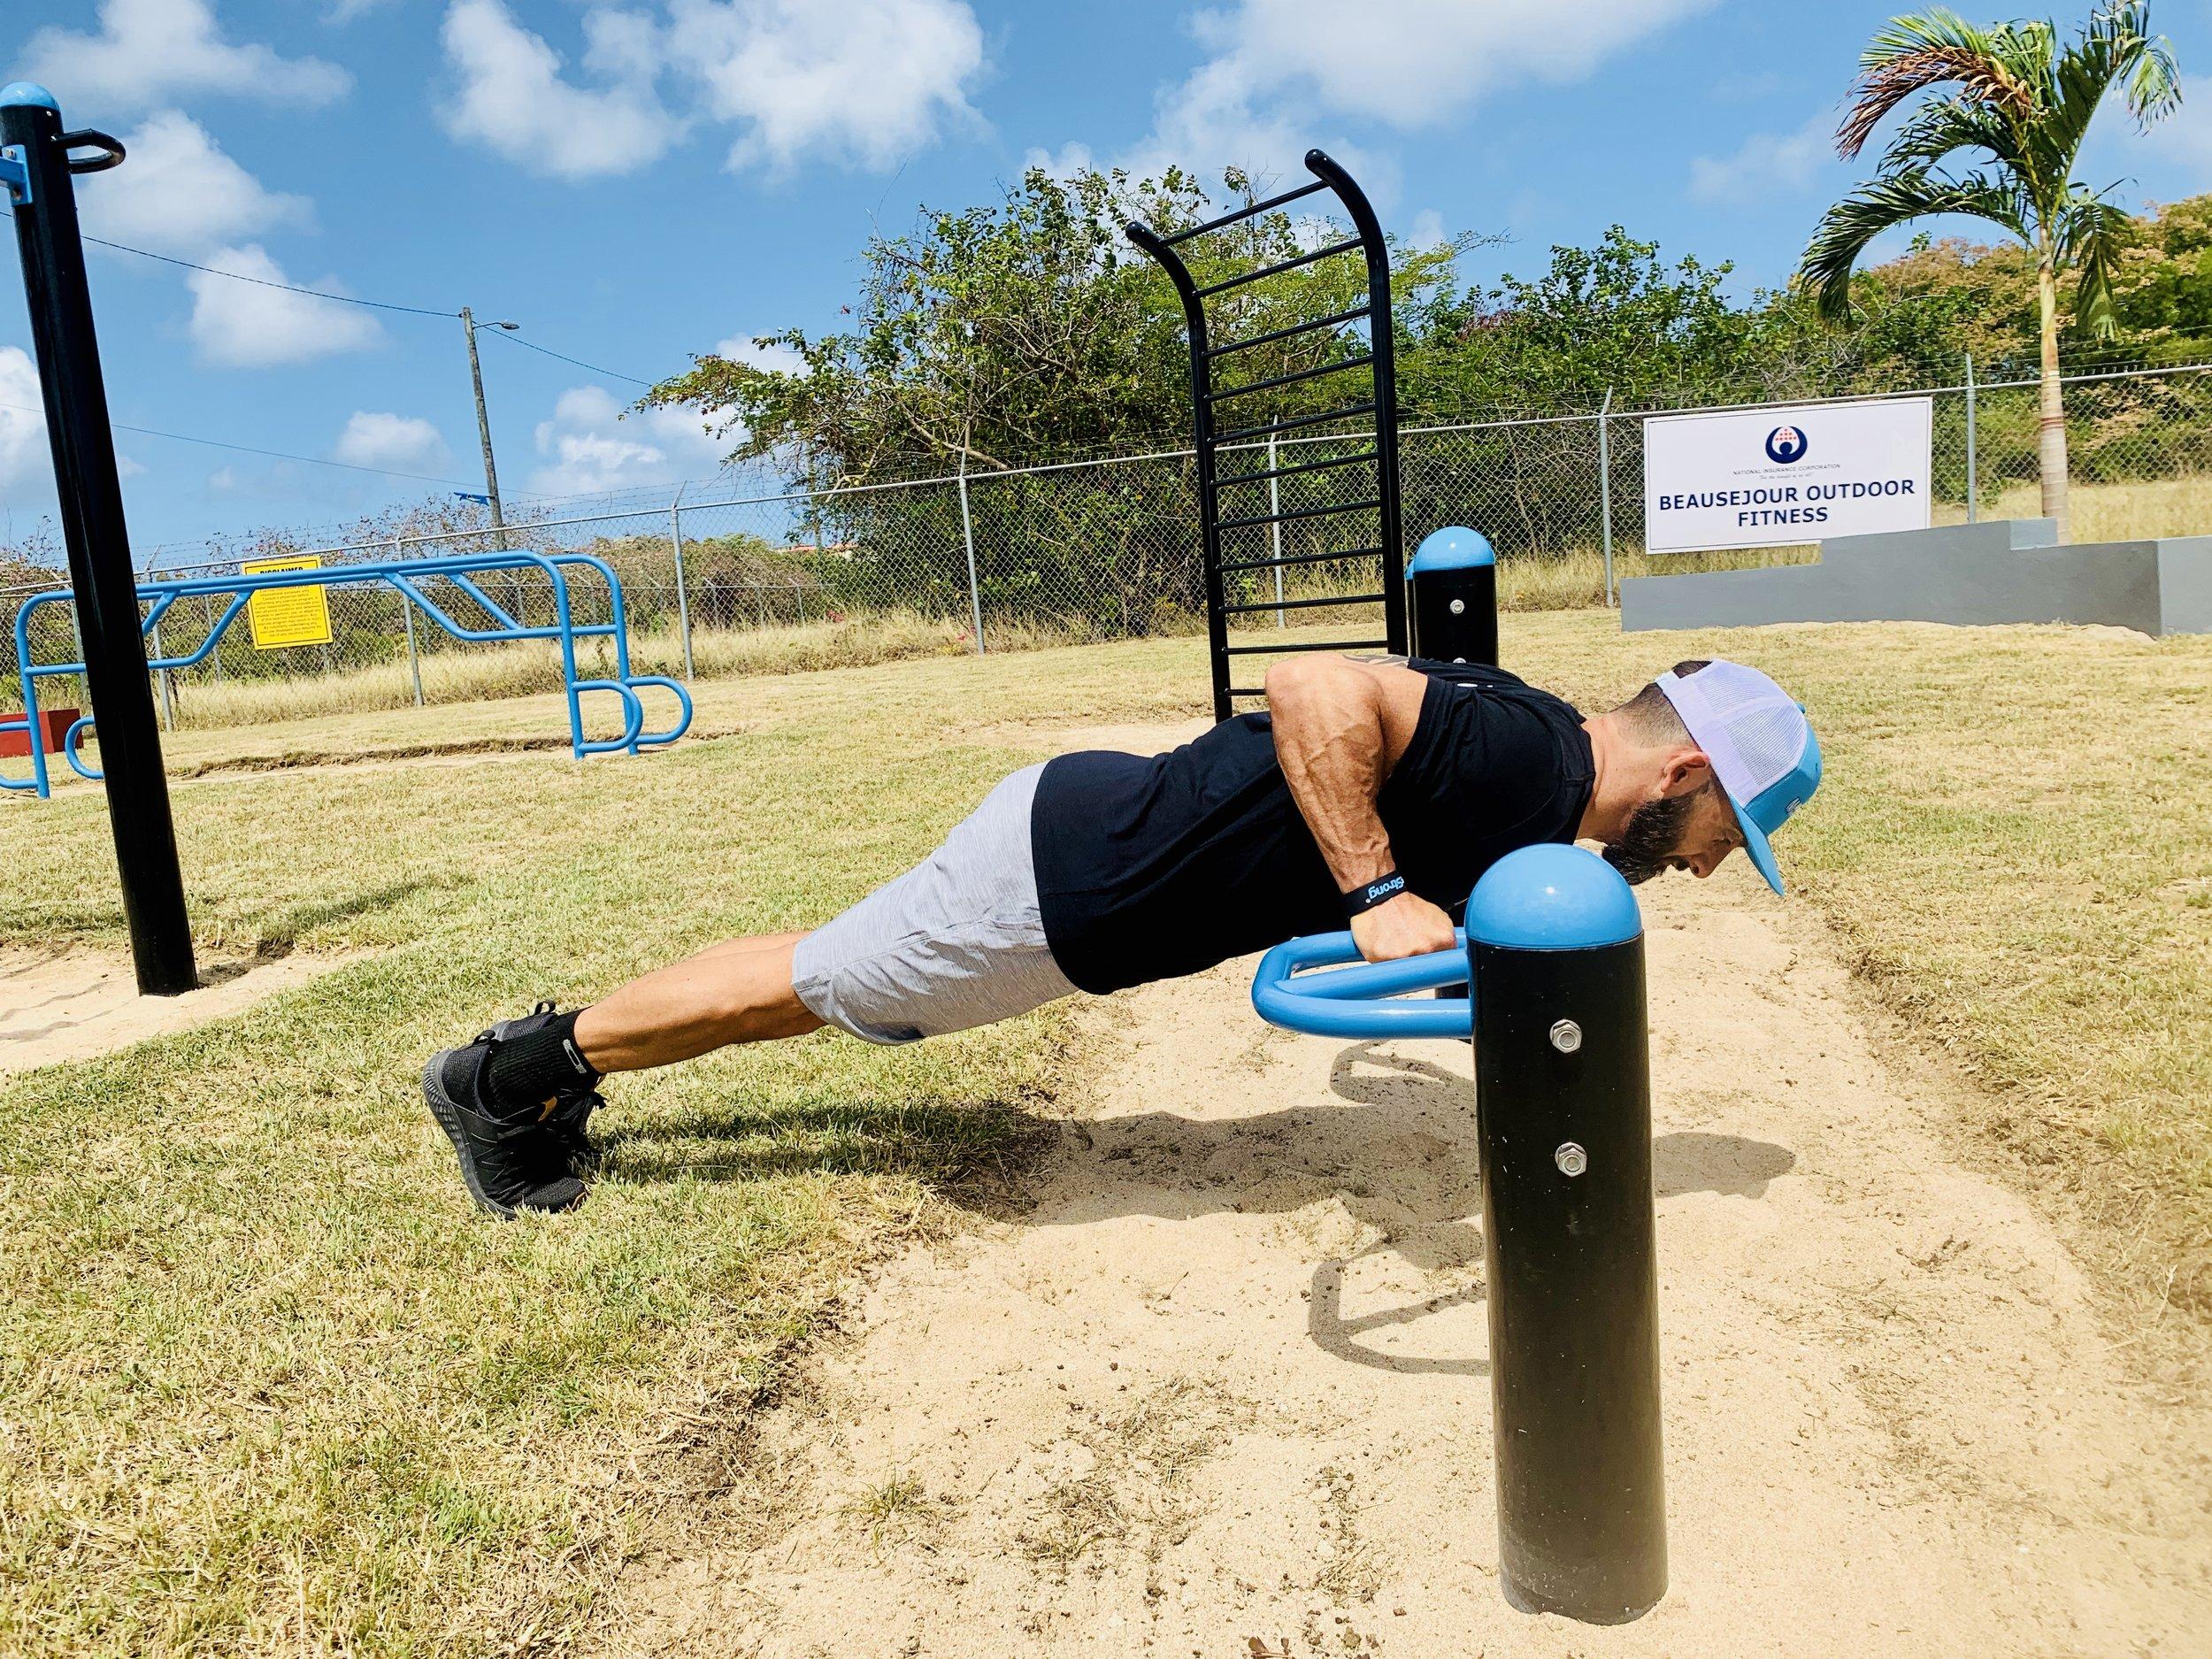 Push-up calisthenics bars outdoor gym park